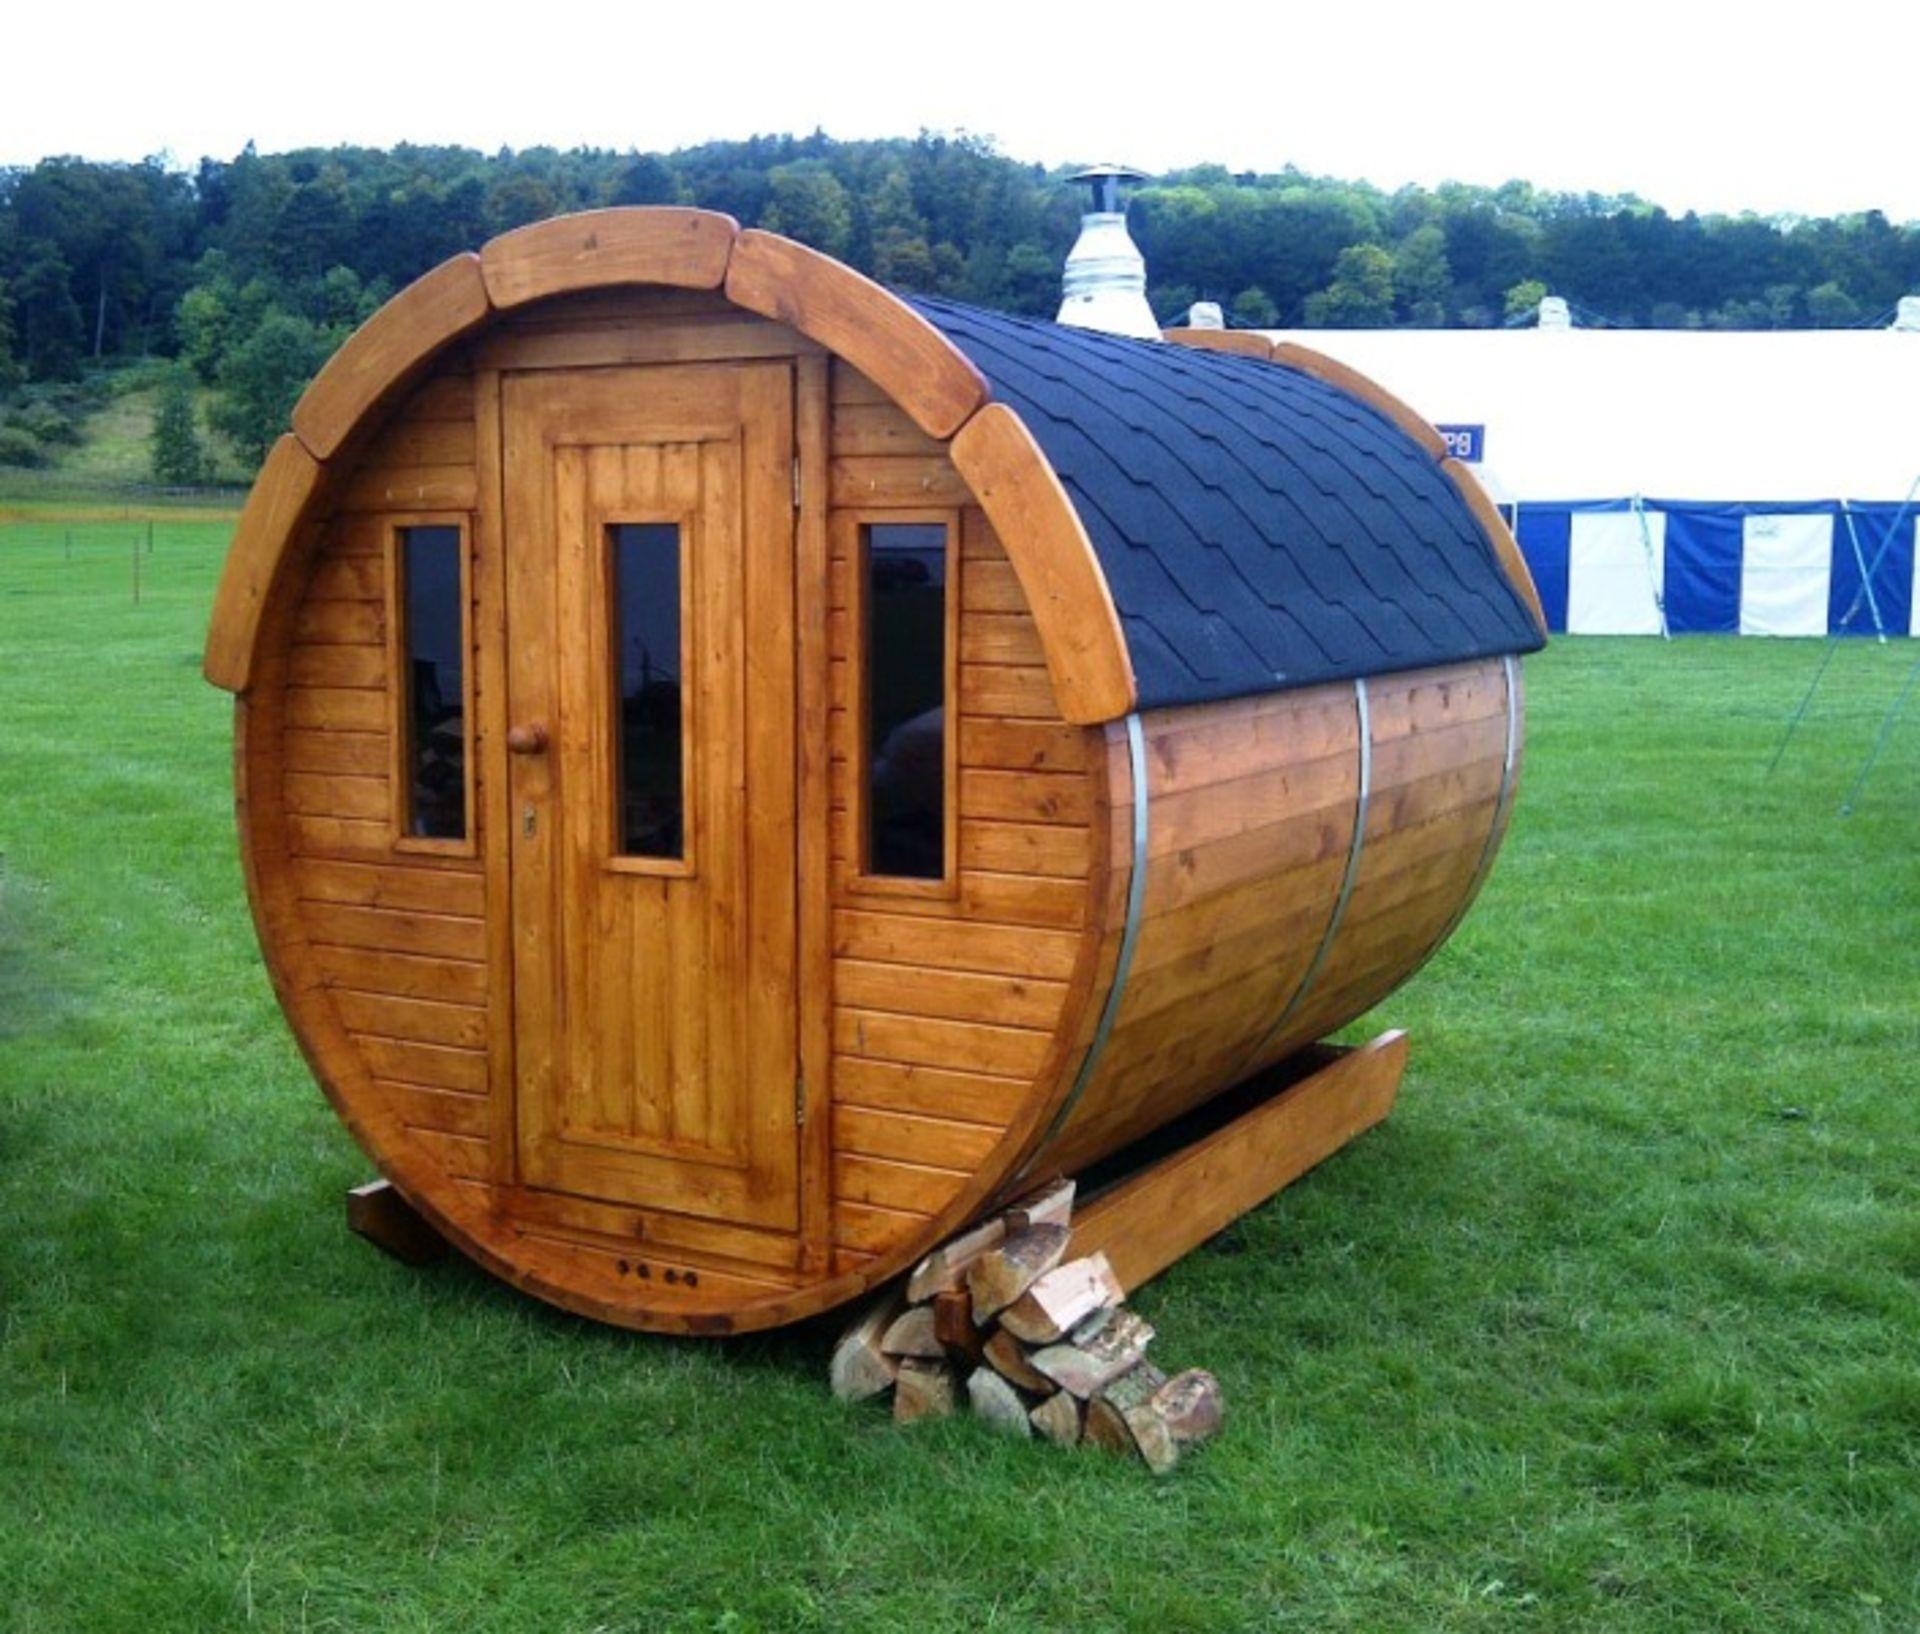 Lot 18012 - V Brand New Superb 2m Garden Sauna Barrel *FULLY ASSEMBLED* - Powerful Harvia Electric Heater -